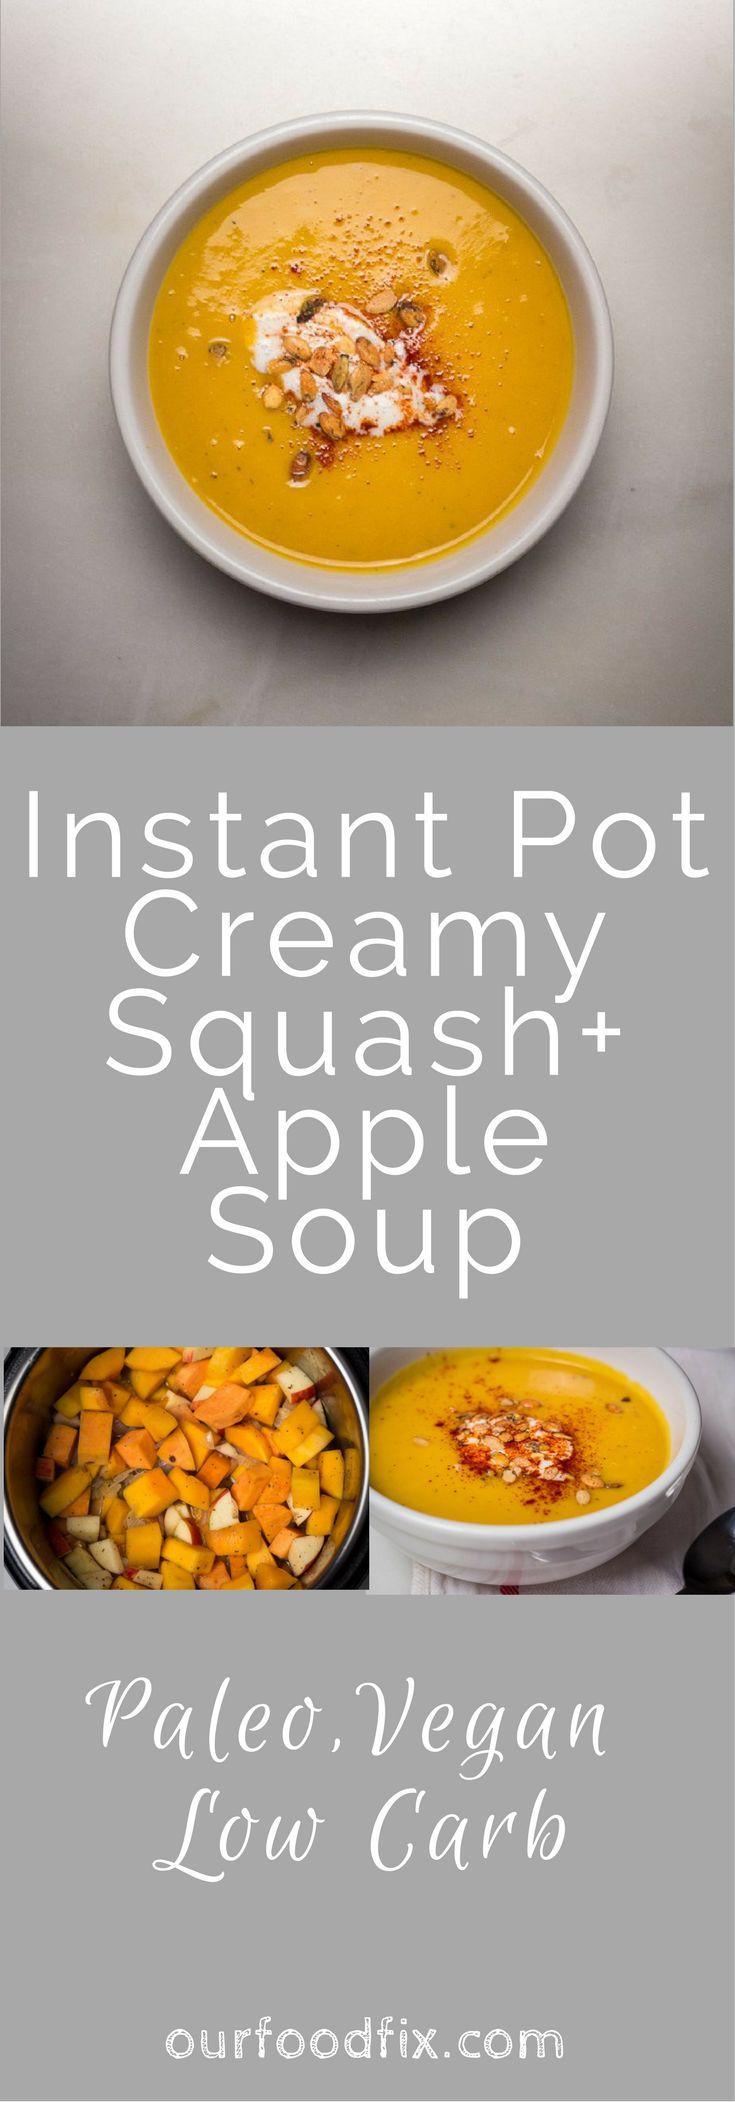 Instant Pot Pressure Cooker Creamy Squash + Apple Soup - Gluten-free, vegan, paleo